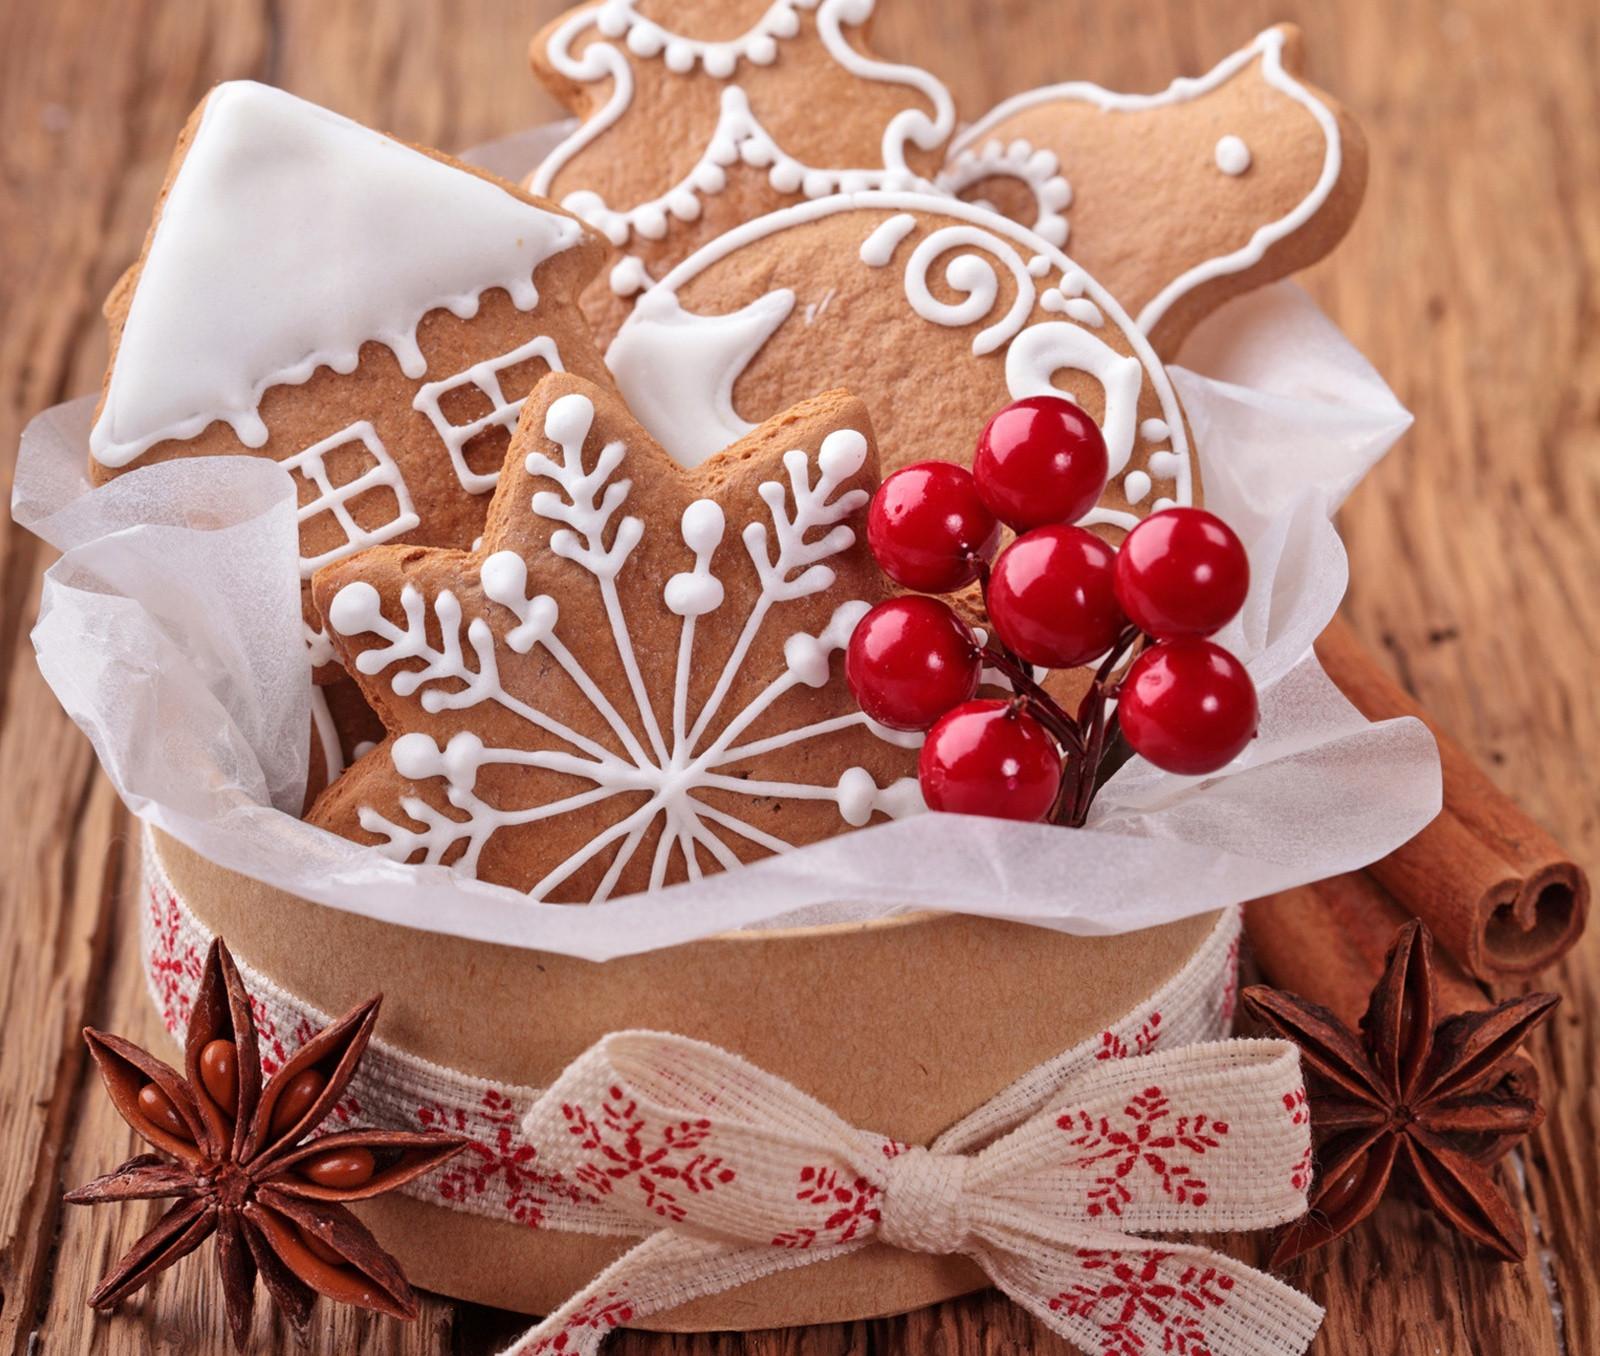 Christmas Cookies Wallpaper  Christmas Cookies Wallpapers